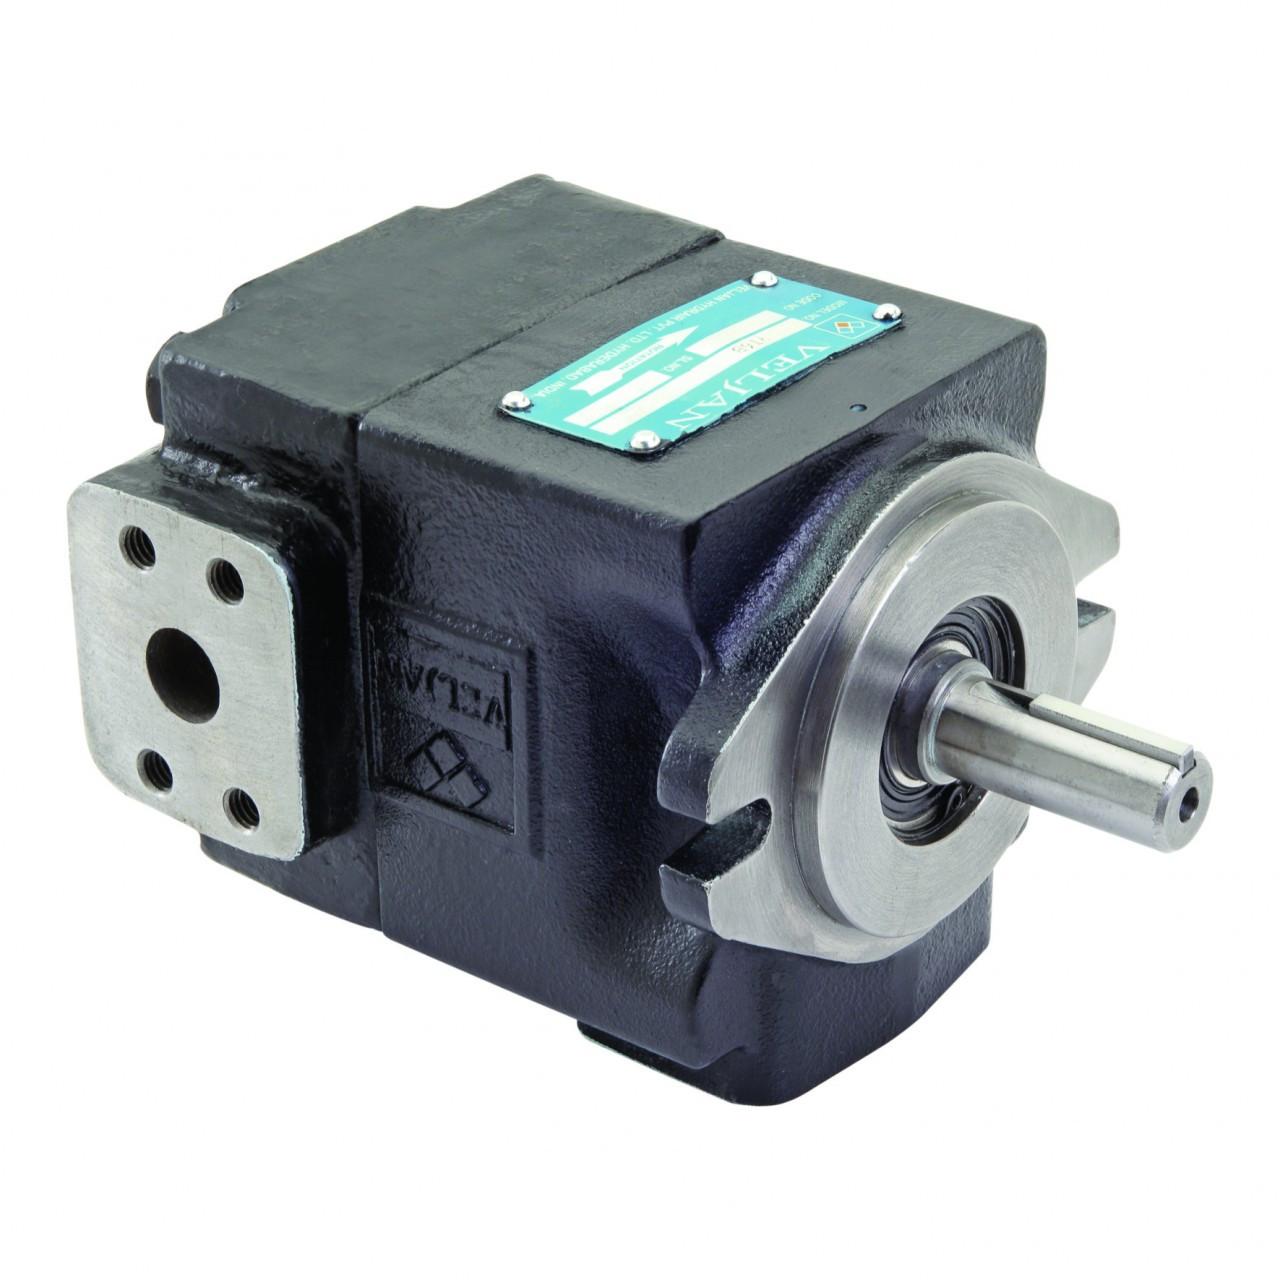 Veljan Single Vane Pump - VT6B - Rons Drivelines | Drivelines | Driveshafts | Differentials